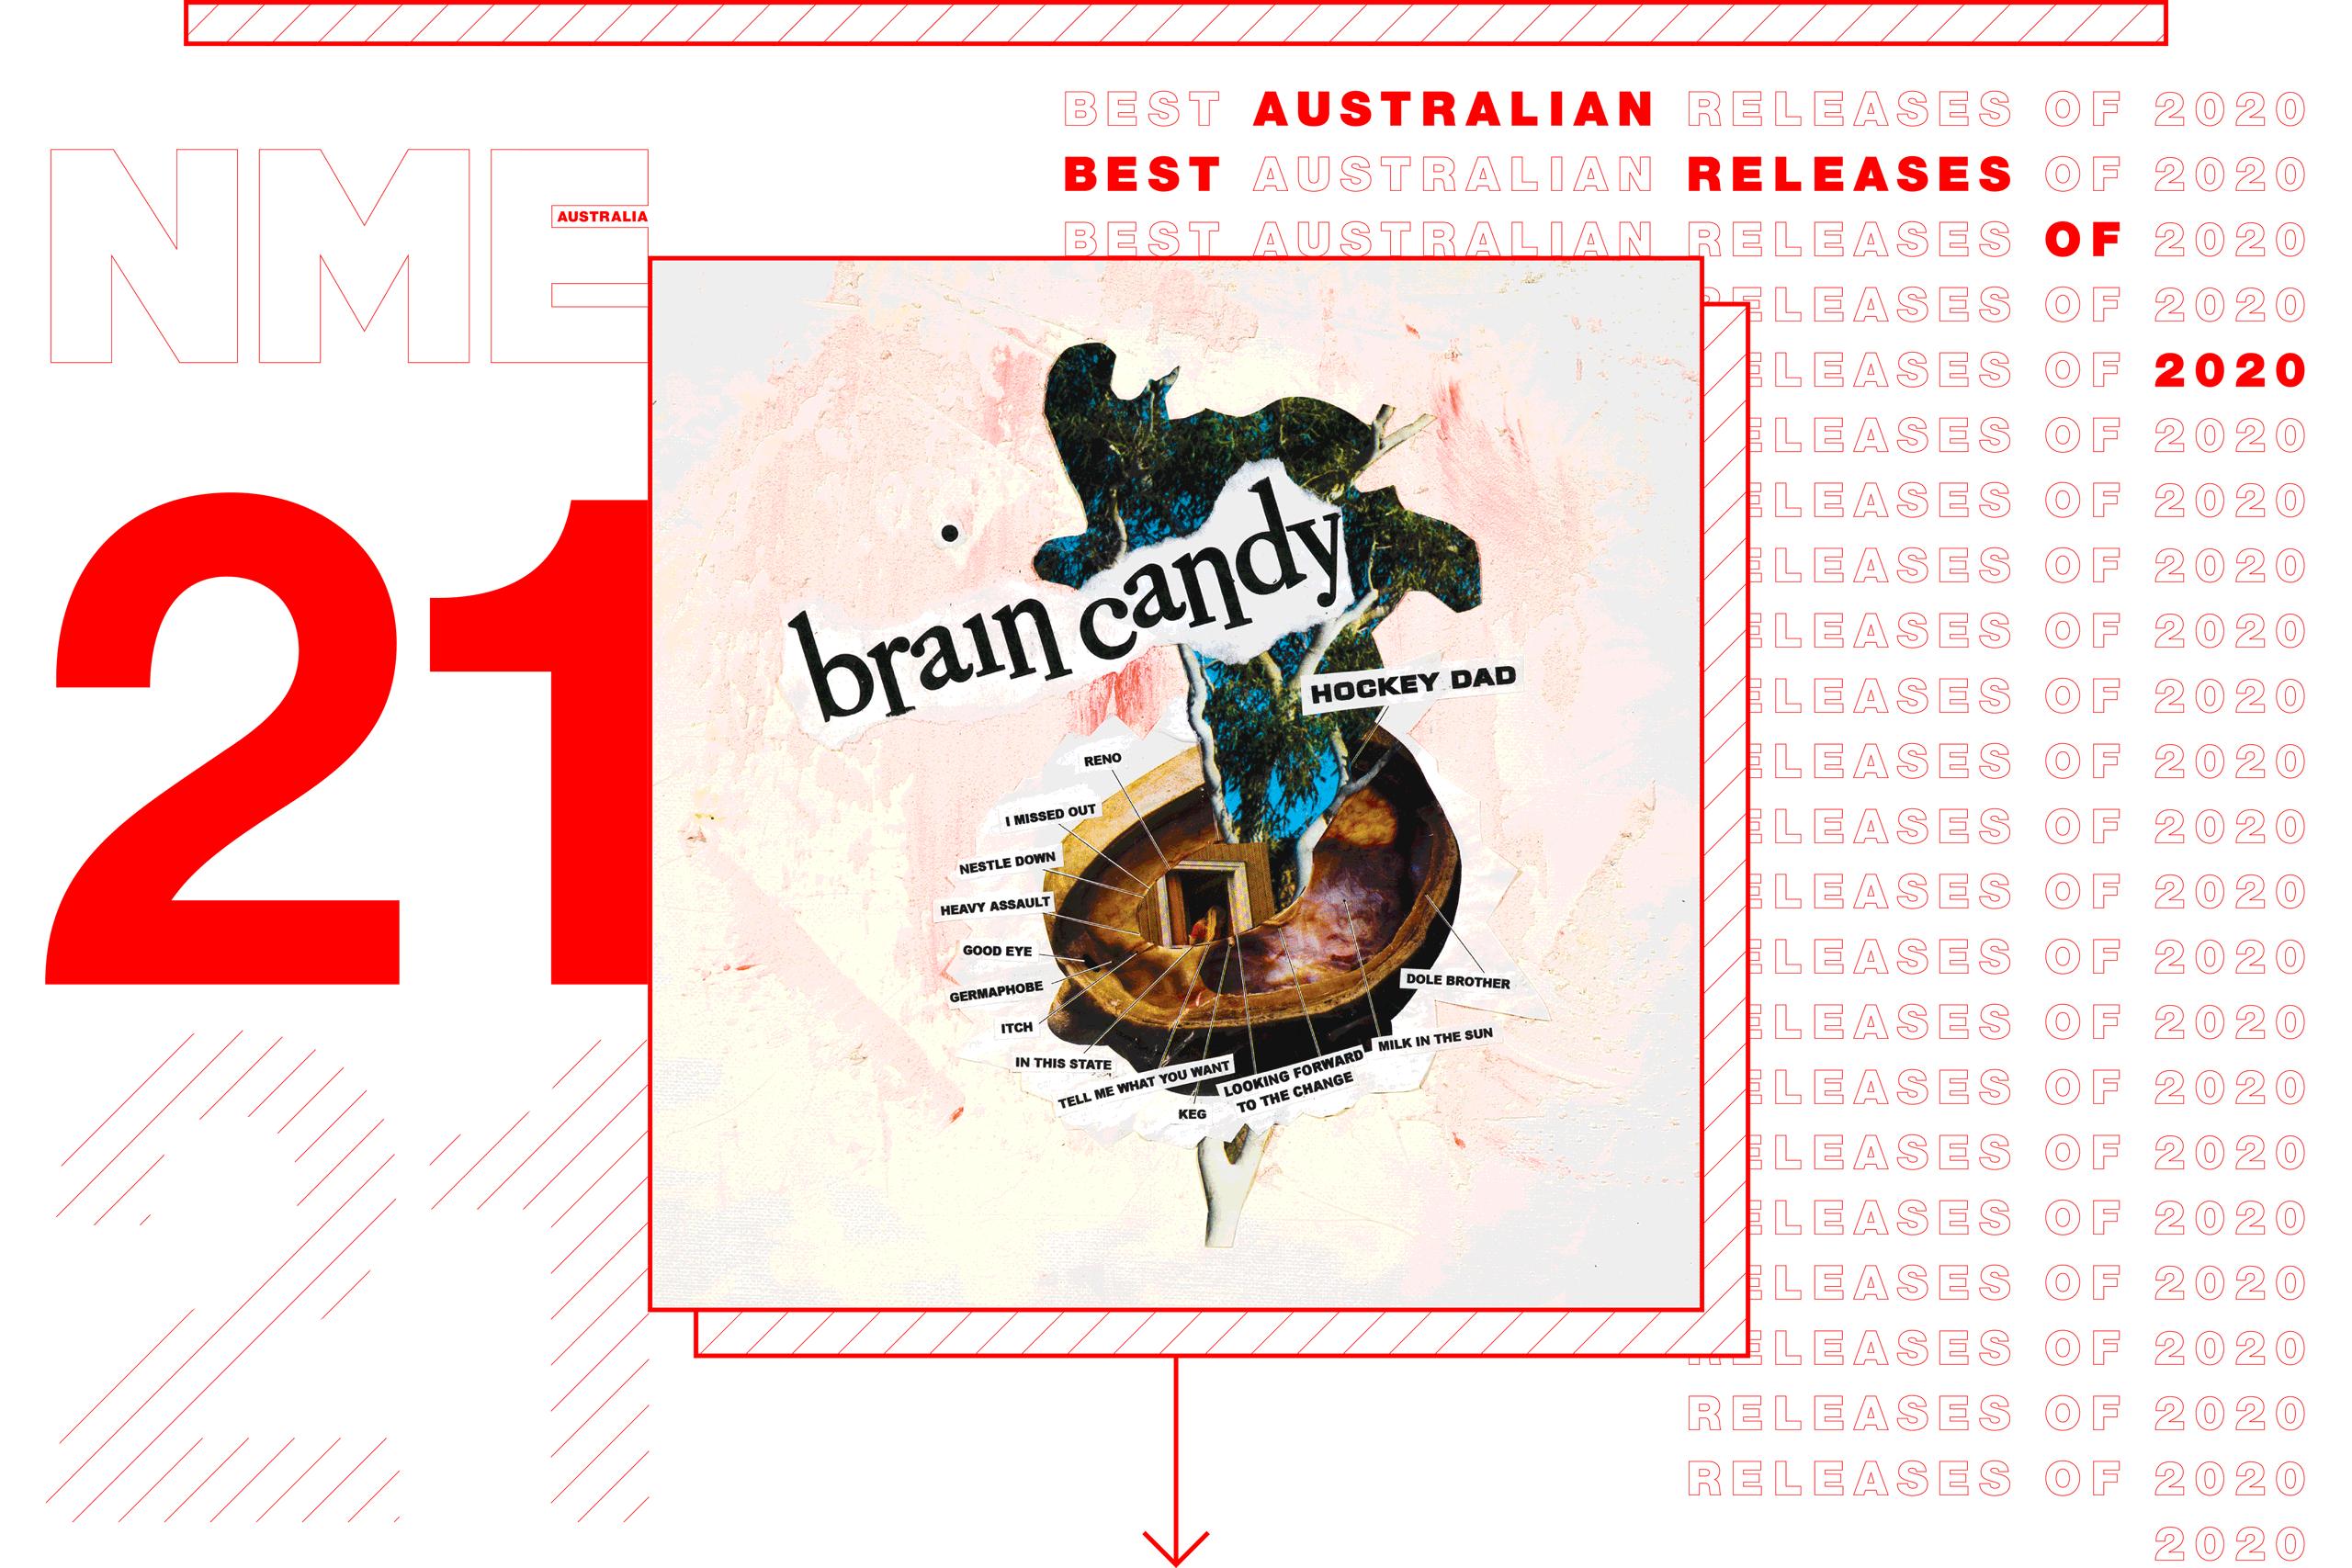 NME Australian Album Release 21